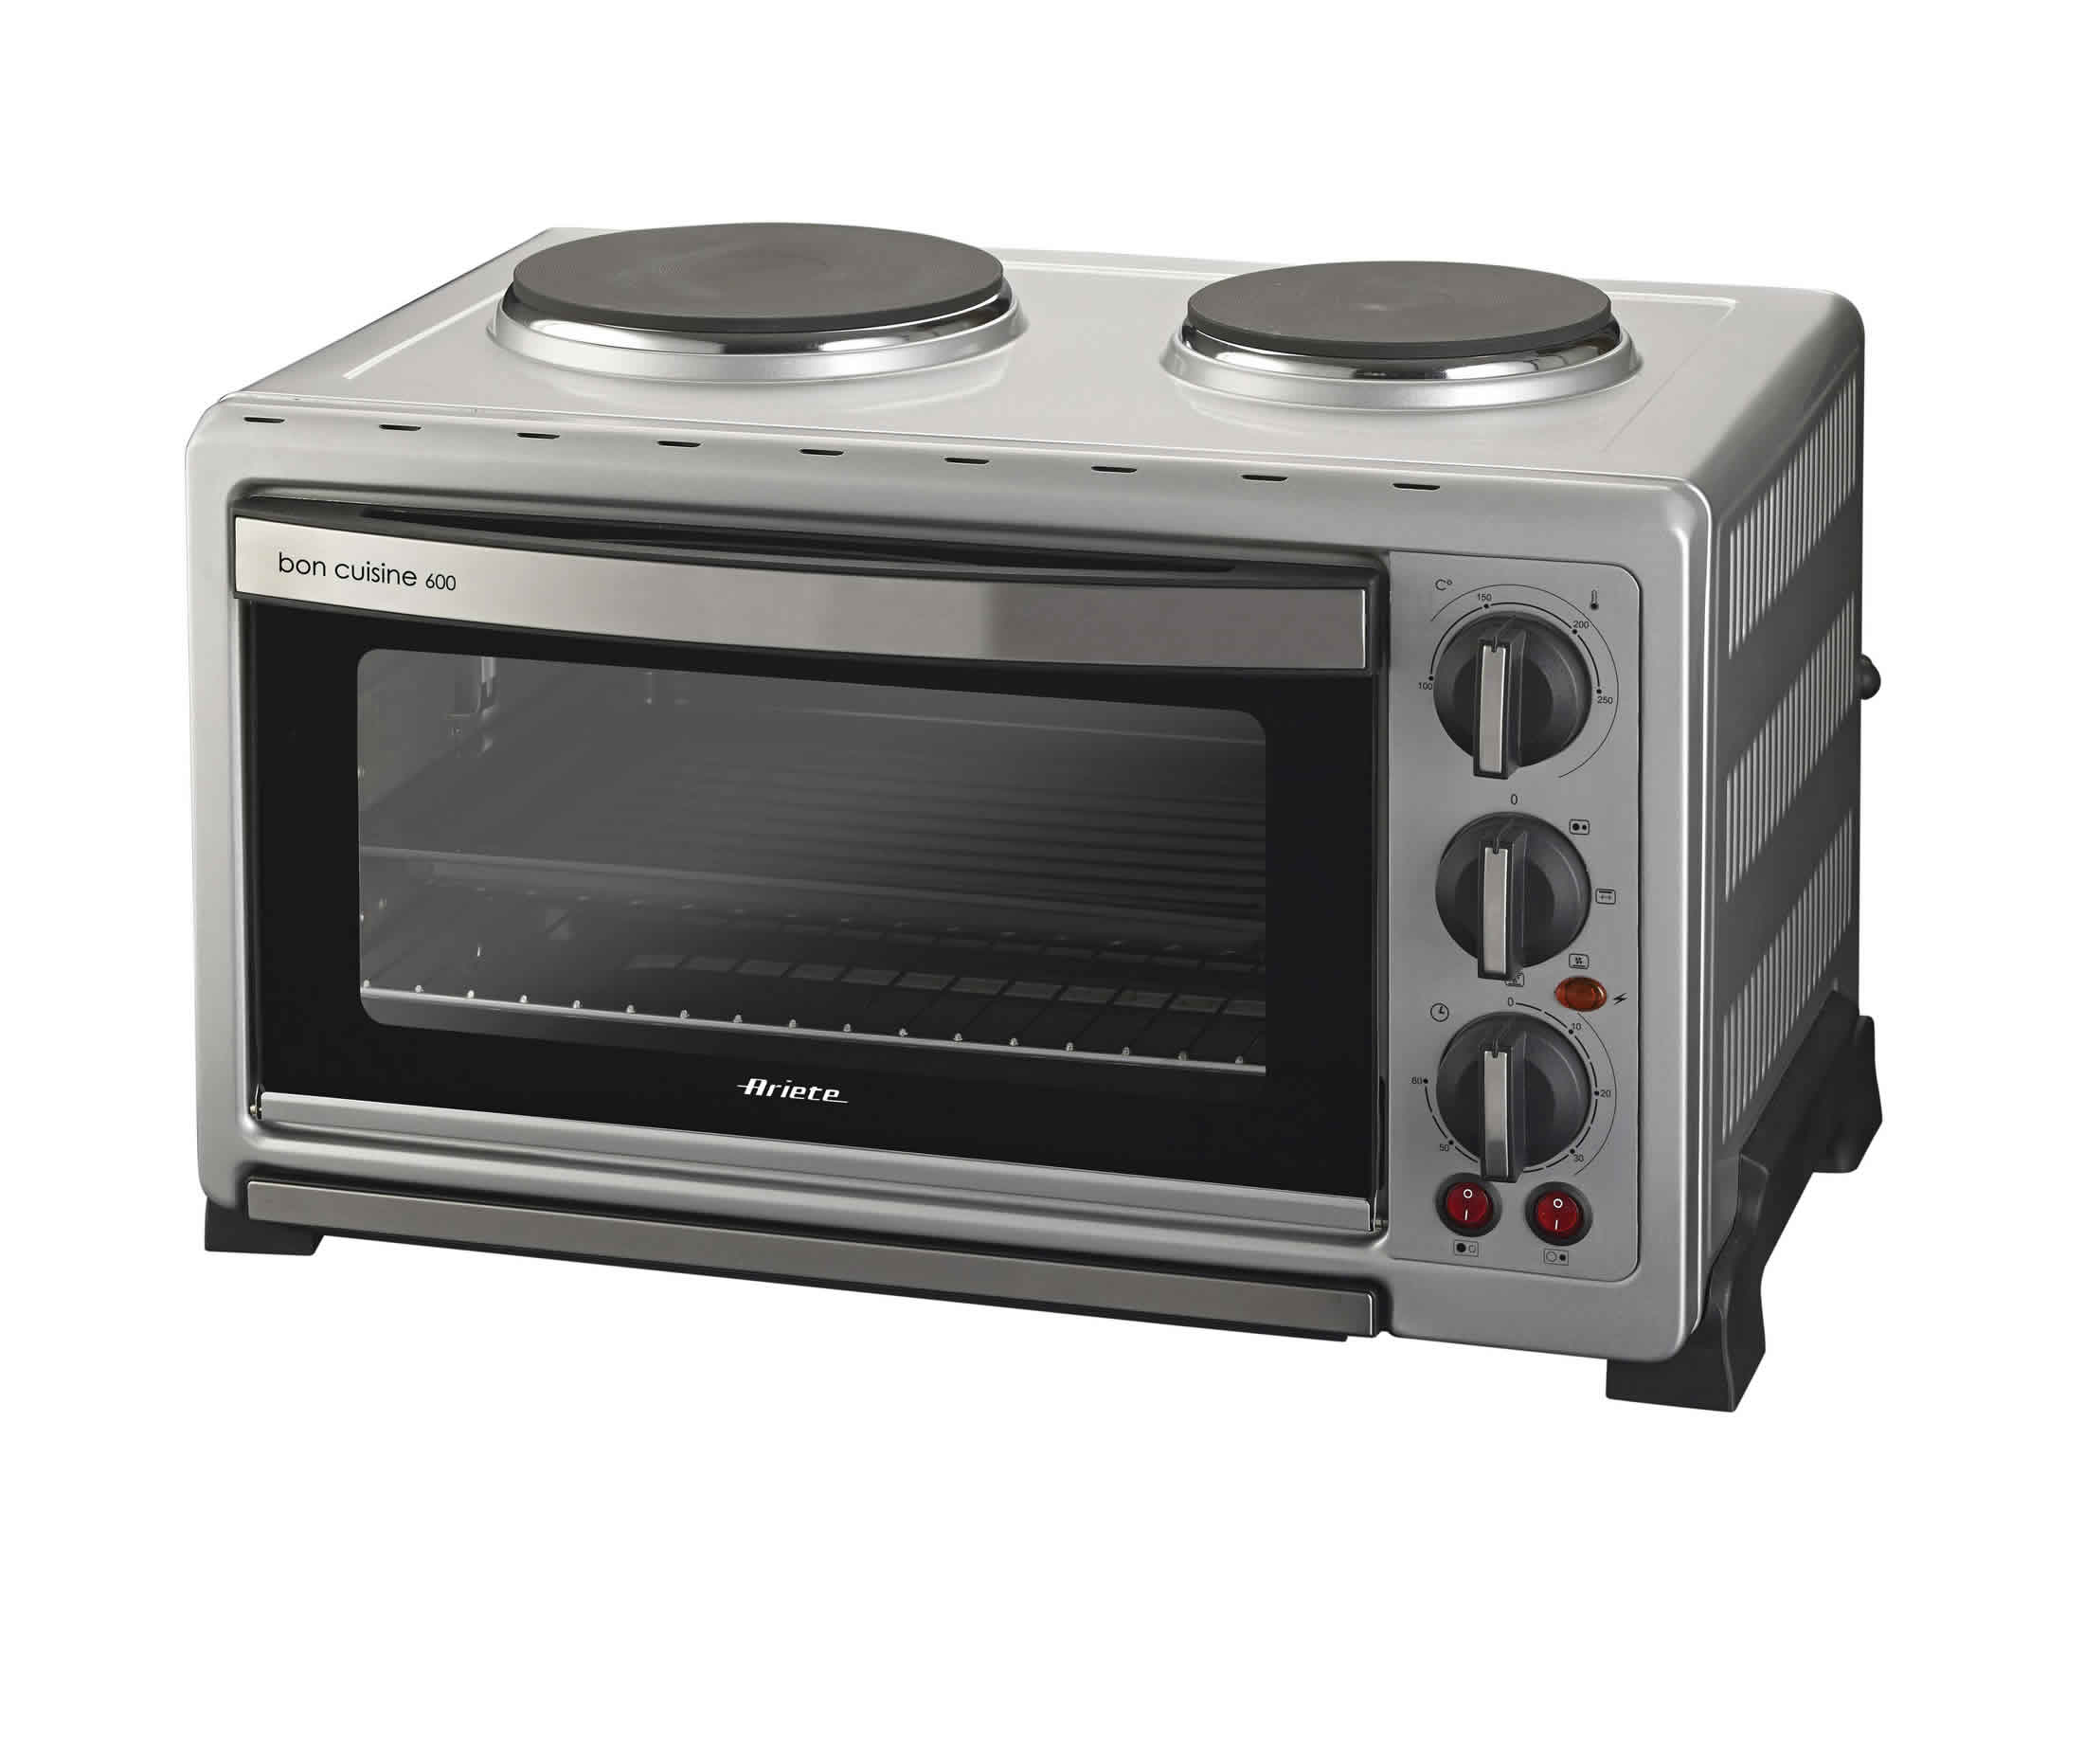 Image of Bon Cuisine 600